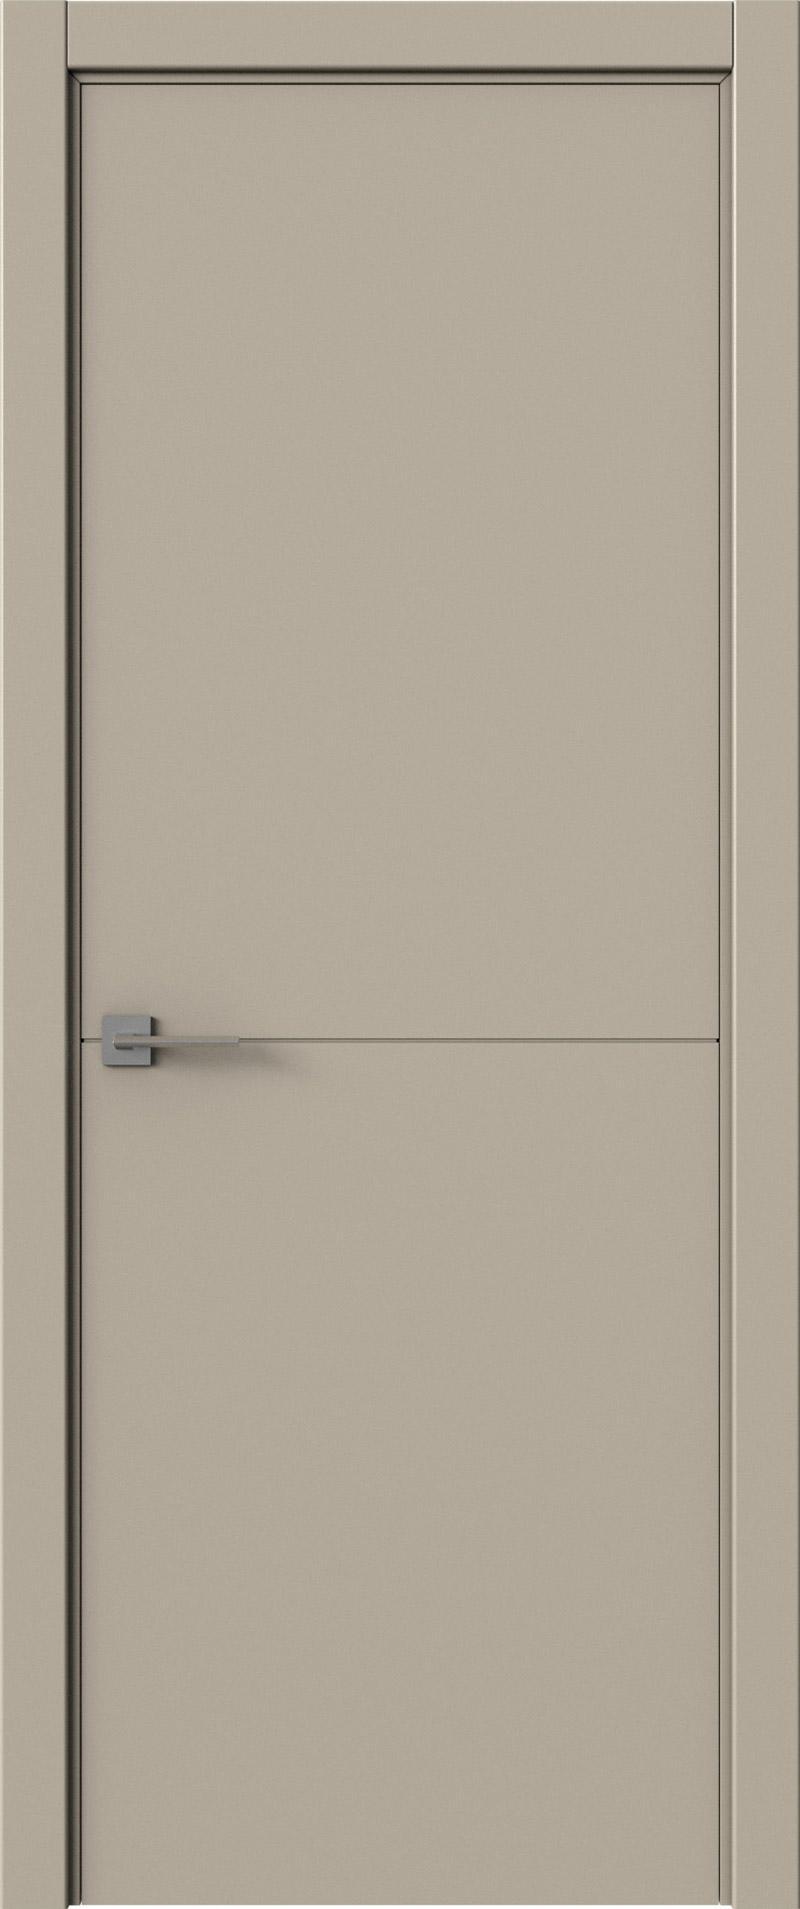 Tivoli Б-2 цвет - Серо-оливковая эмаль (RAL 7032) Без стекла (ДГ)